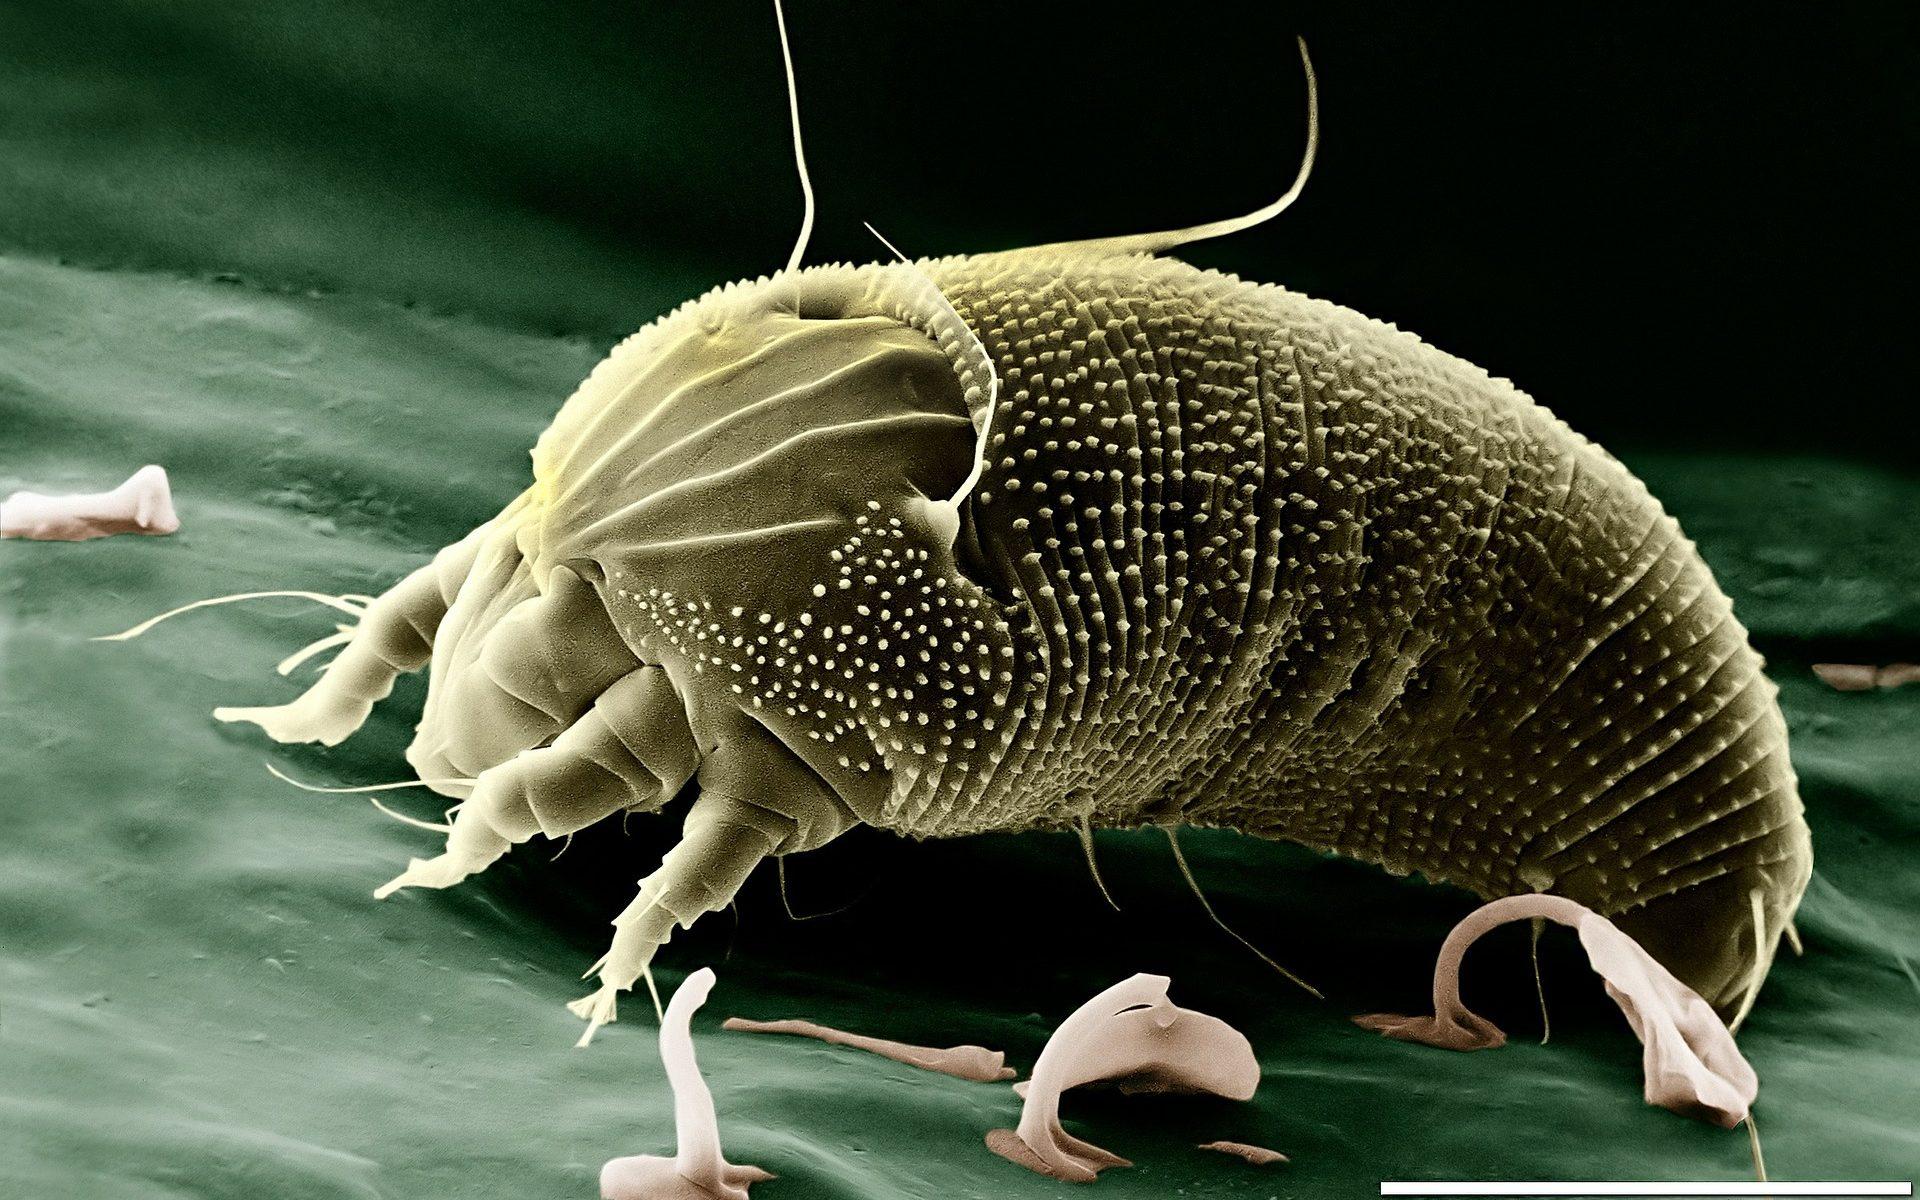 Parasitenalarm - Milben am Hund auf fincanordica.de